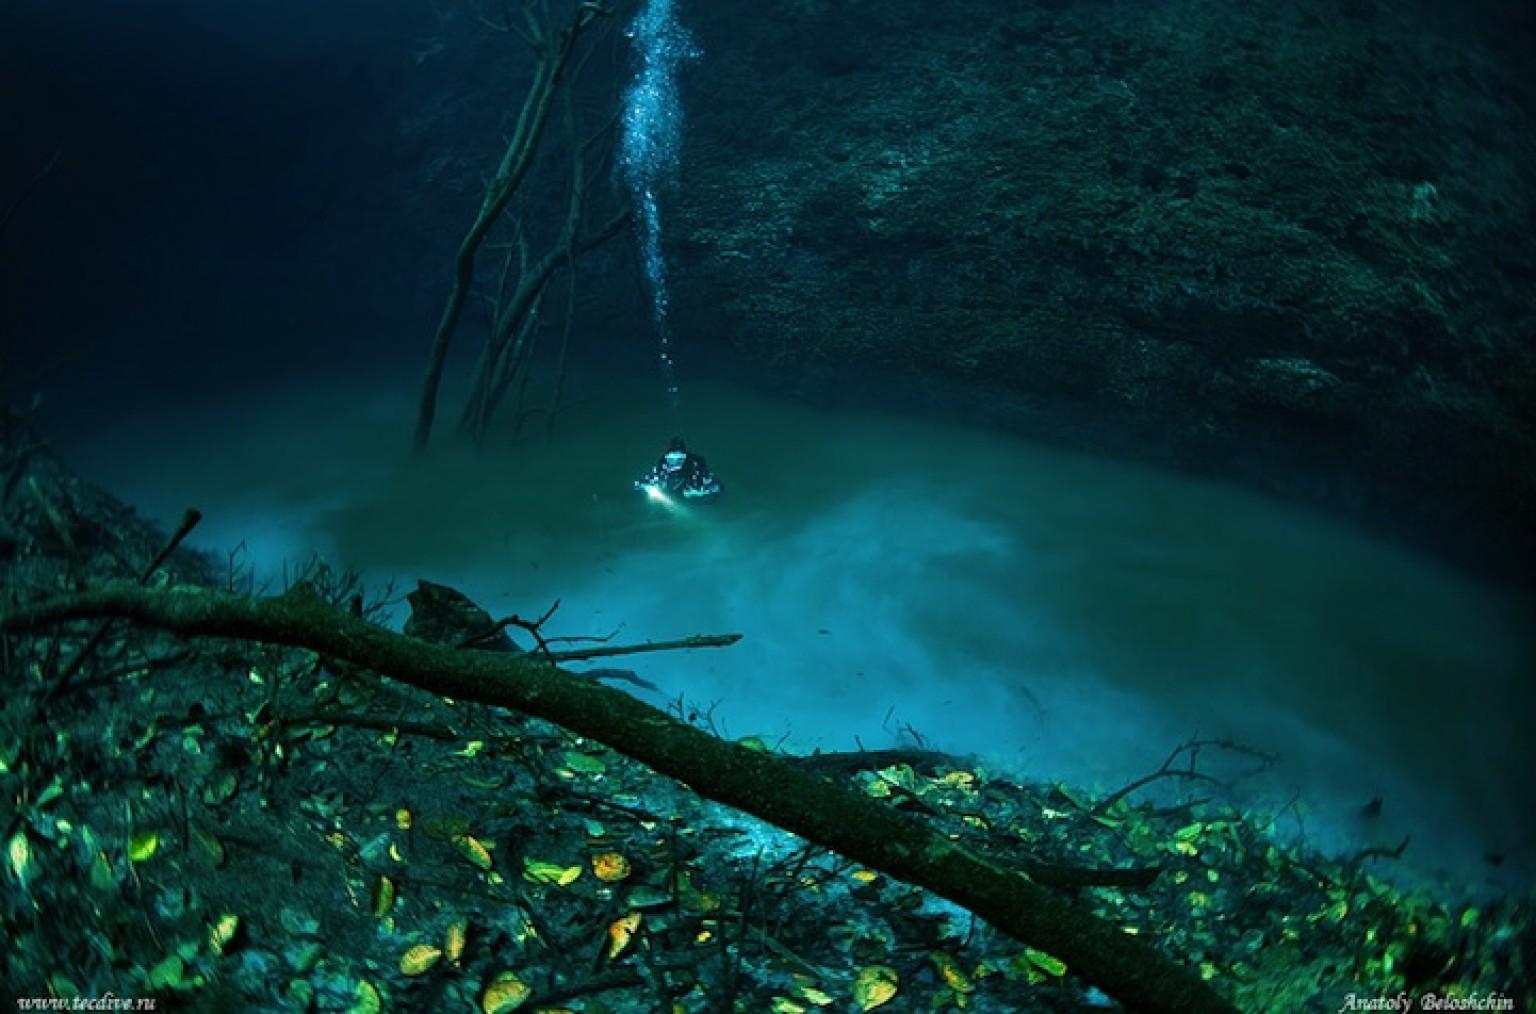 saltwater and freshwater meet underwater forest